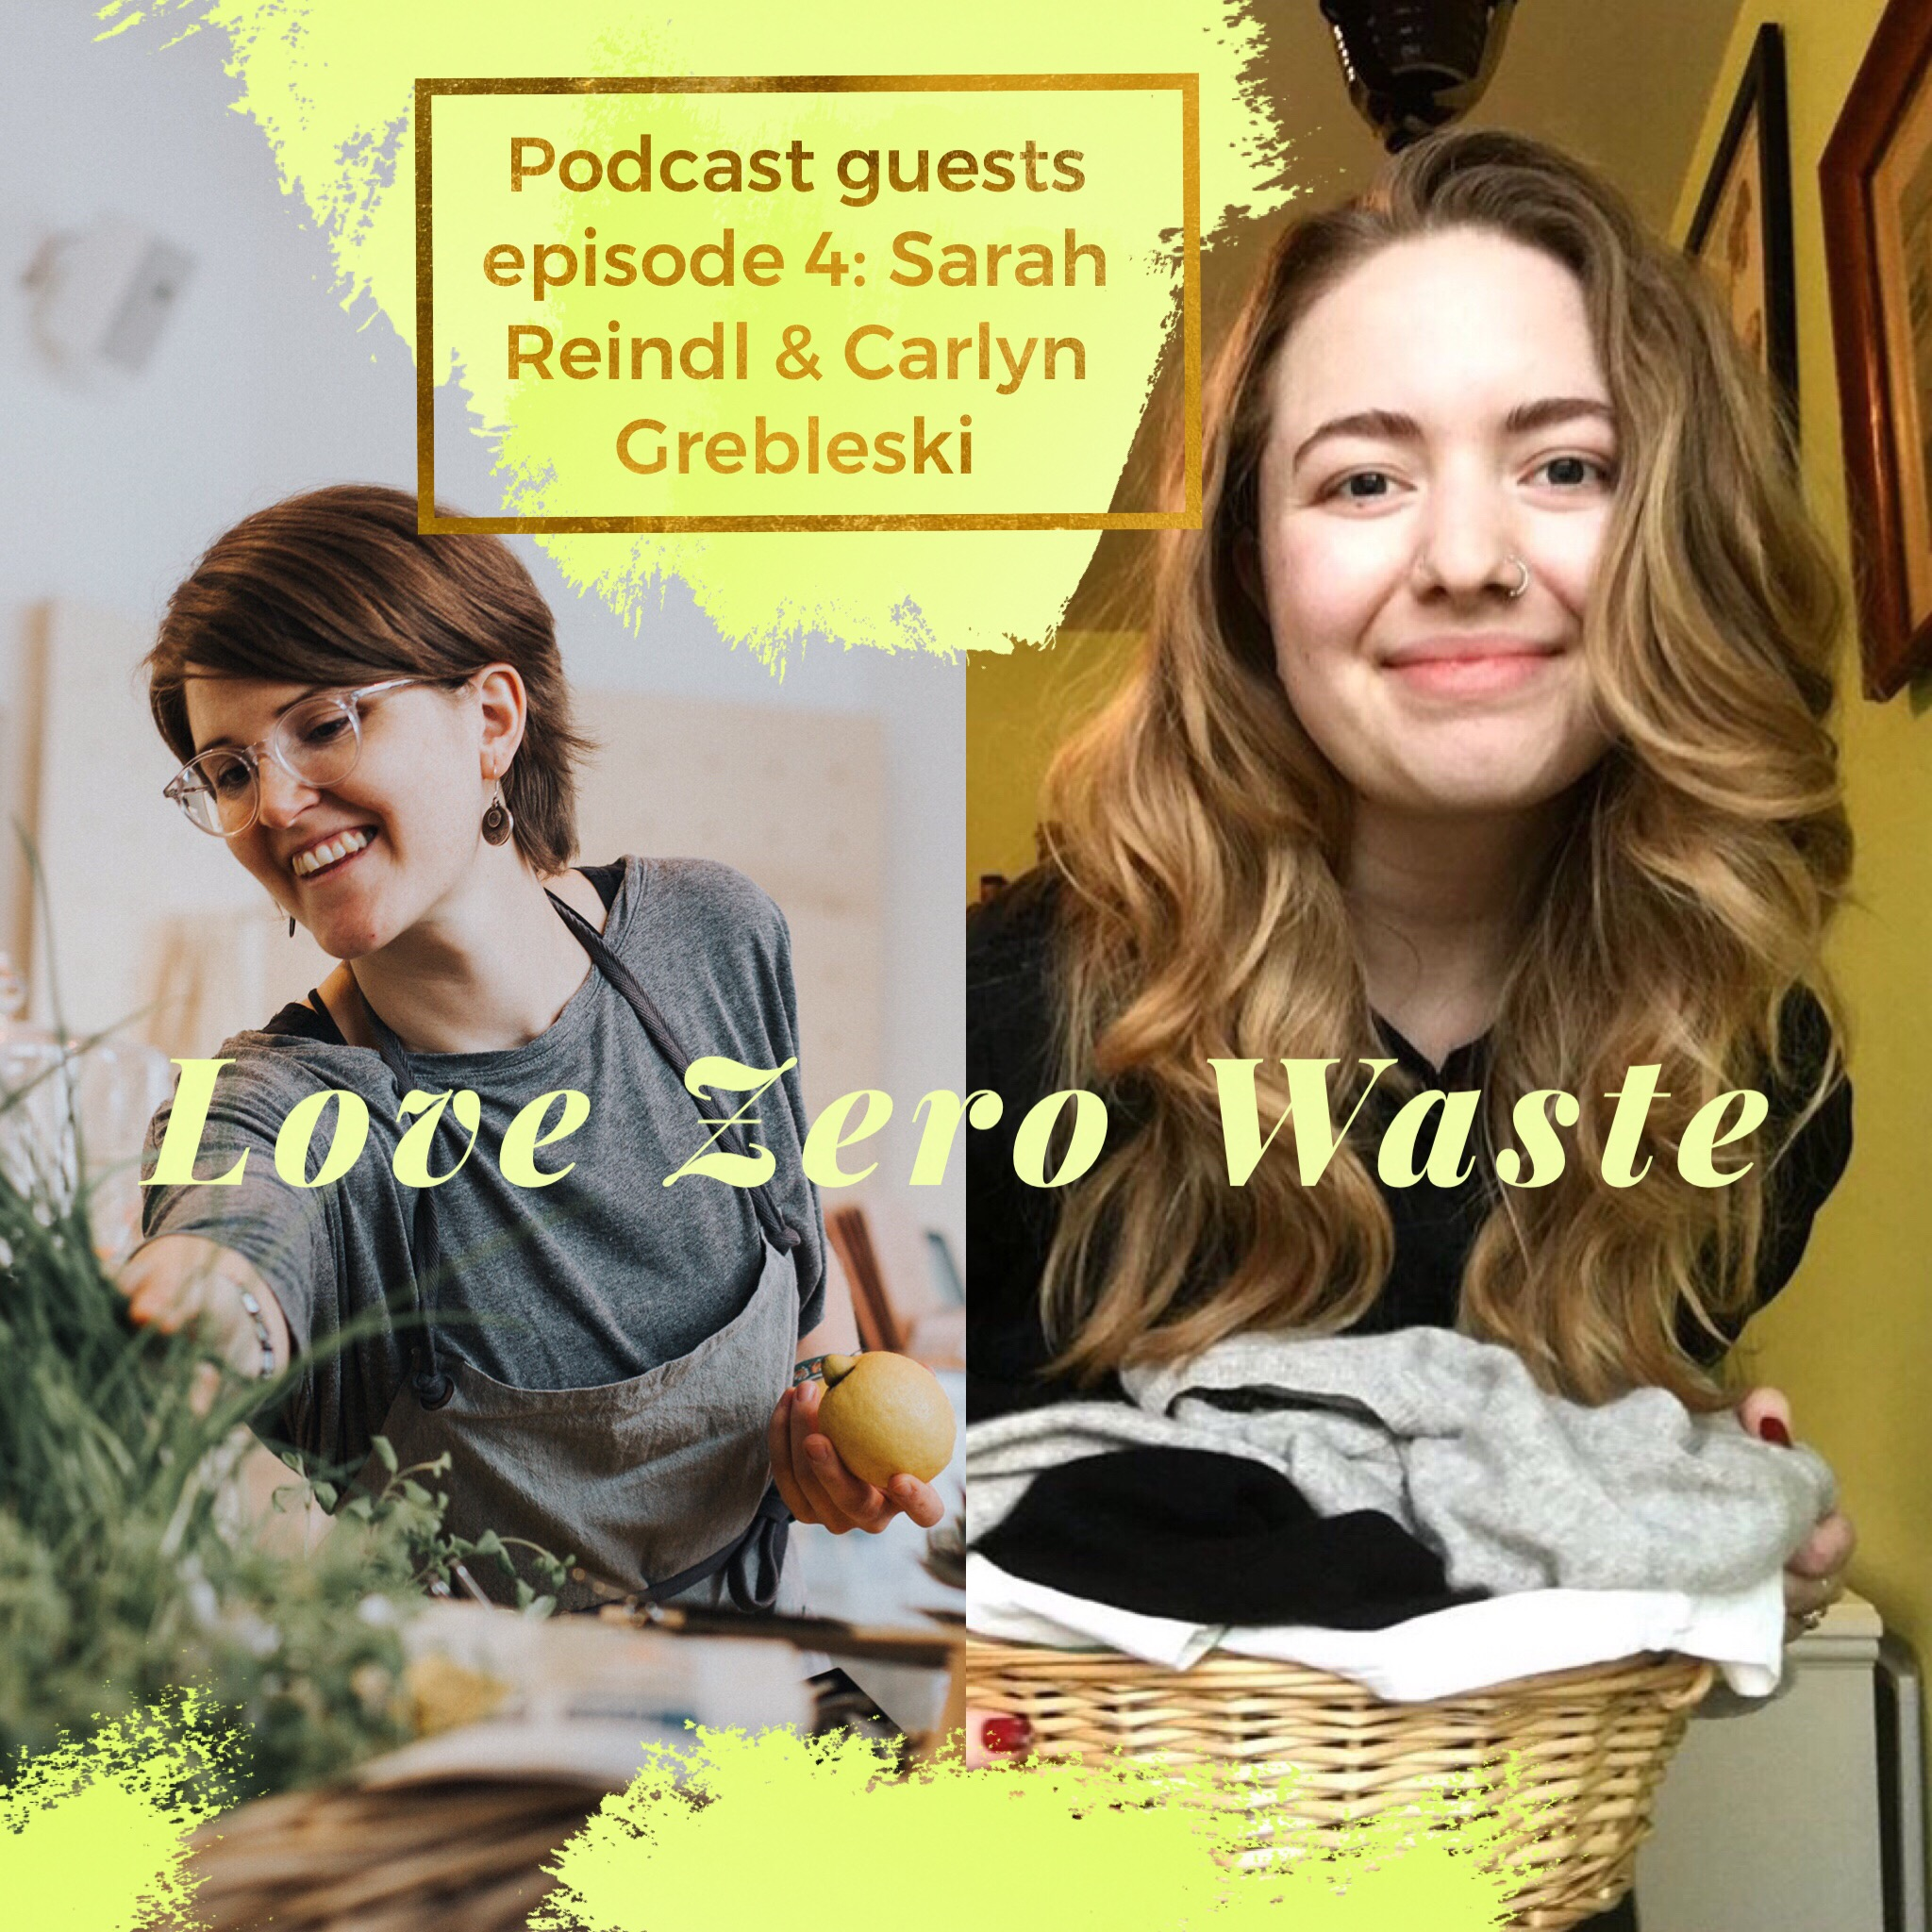 The Love Zero Waste podcast guest: zero waste entrepreneur Sarah Reindl and blogger Carlyn Grebleski.